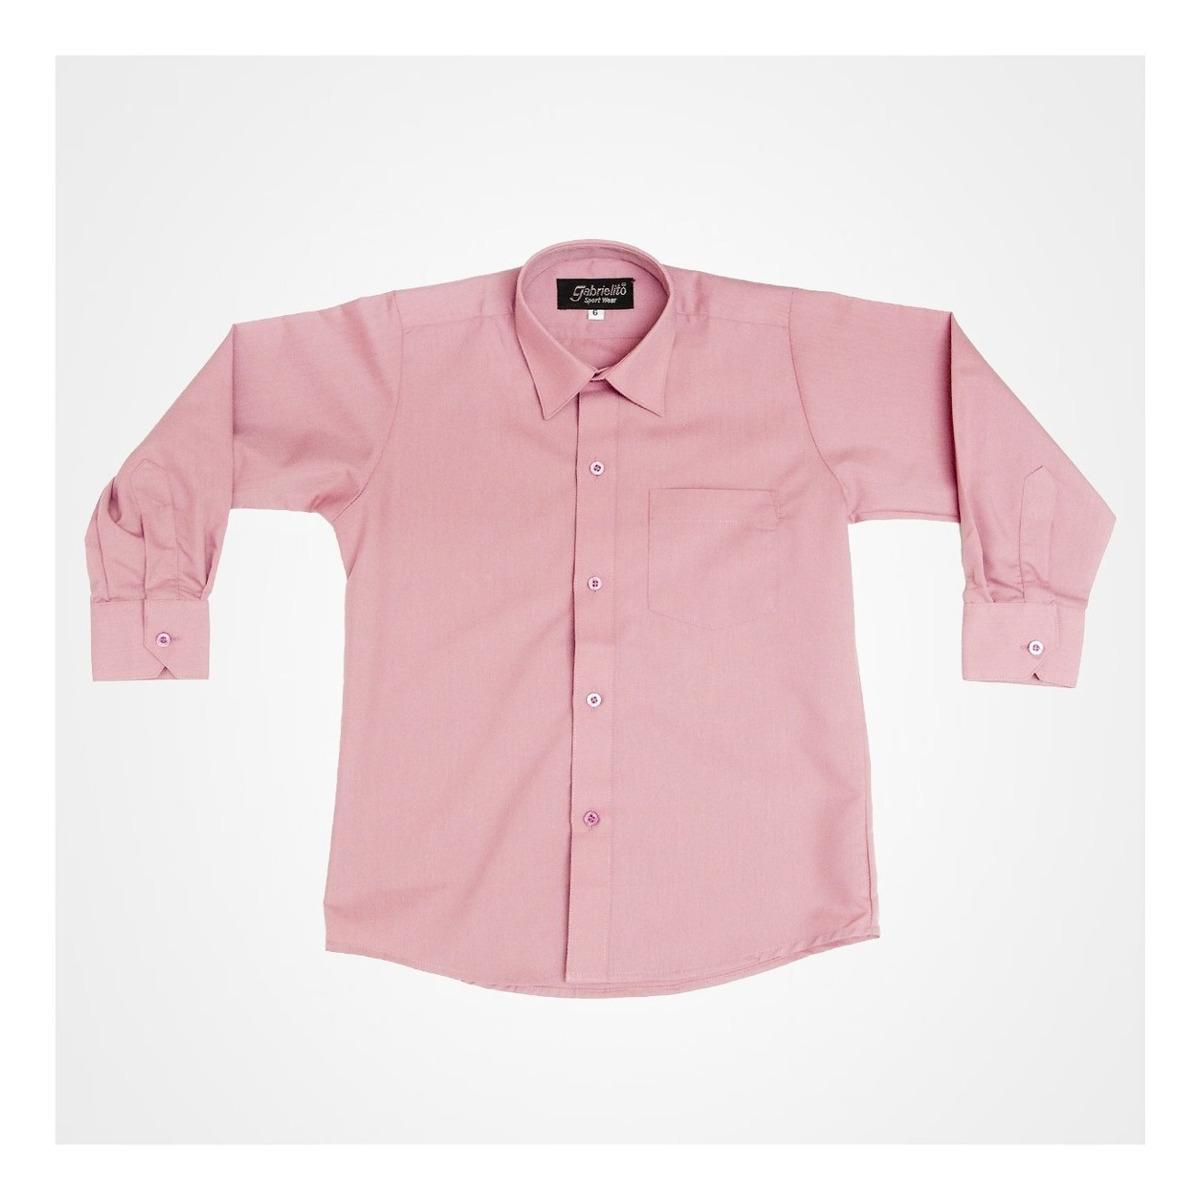 Camisa Manga Larga De Vestir Marca Gabrielito Palo De Rosa